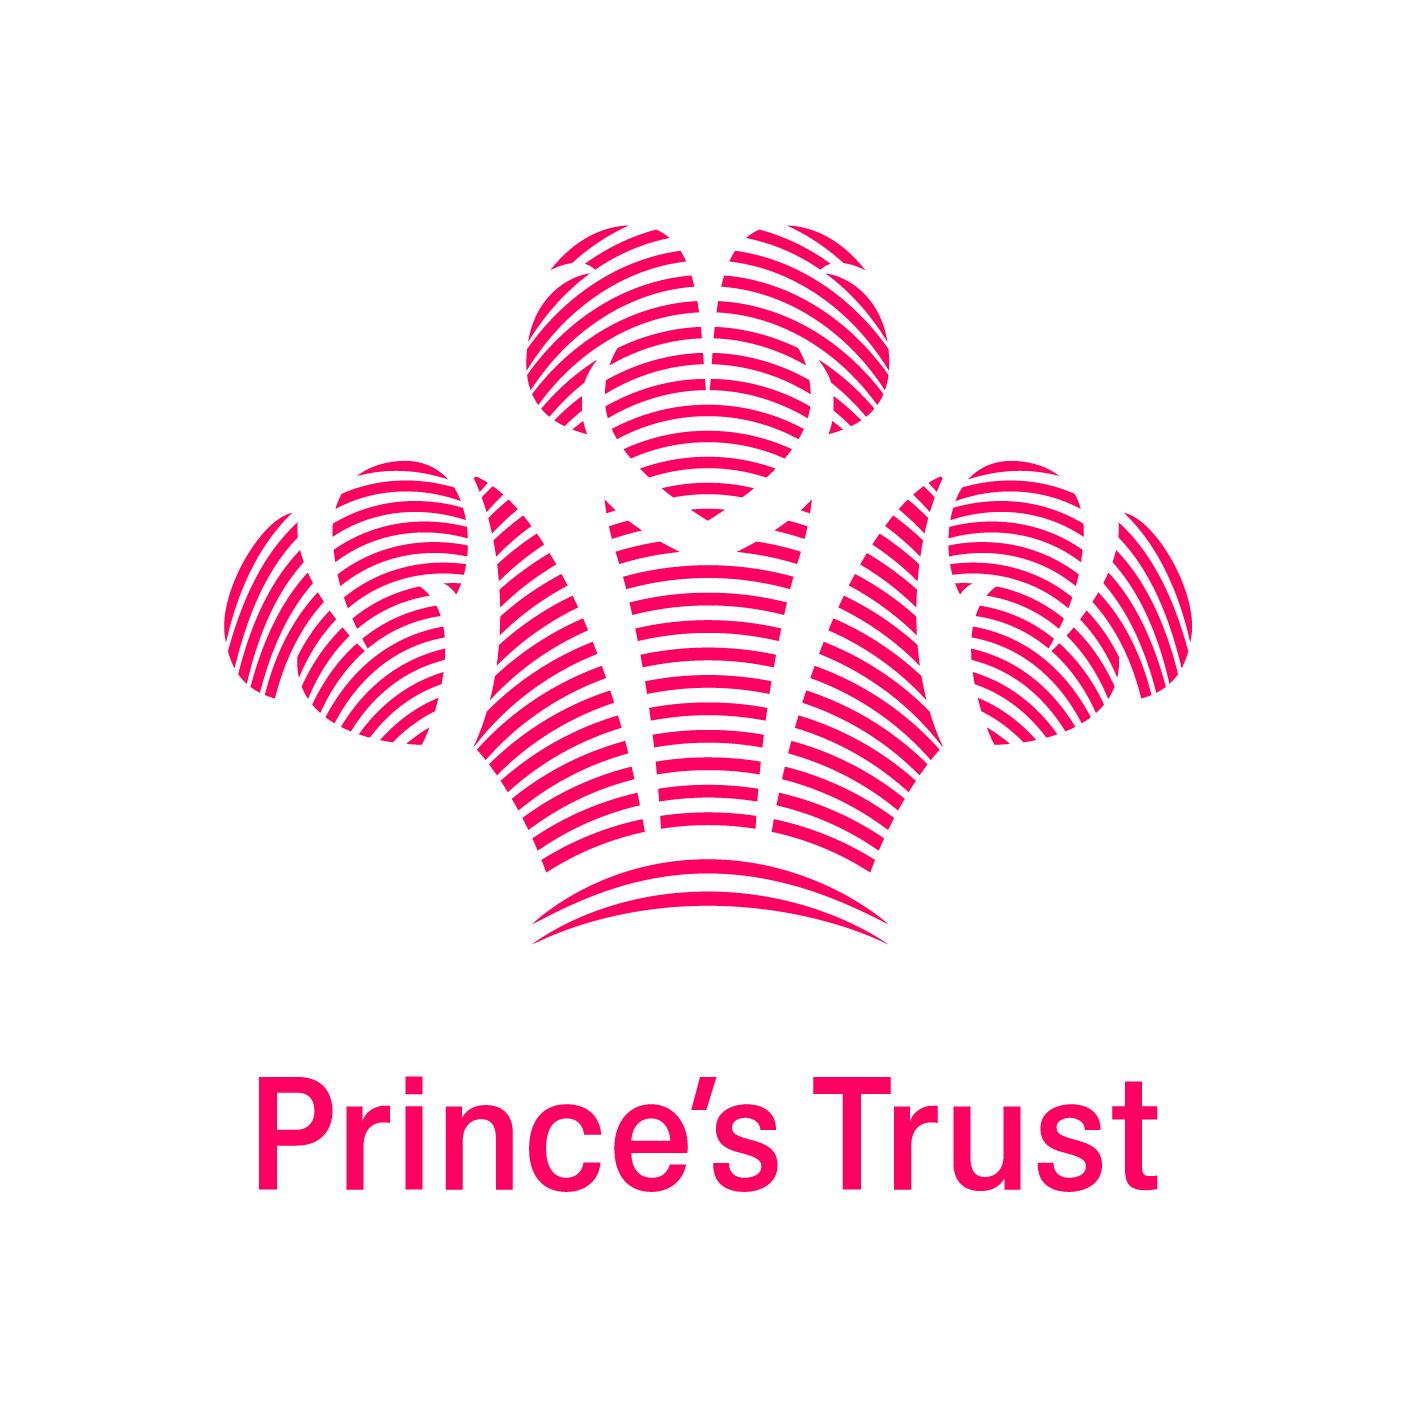 Prince's Trust spot colour - 199.jpg